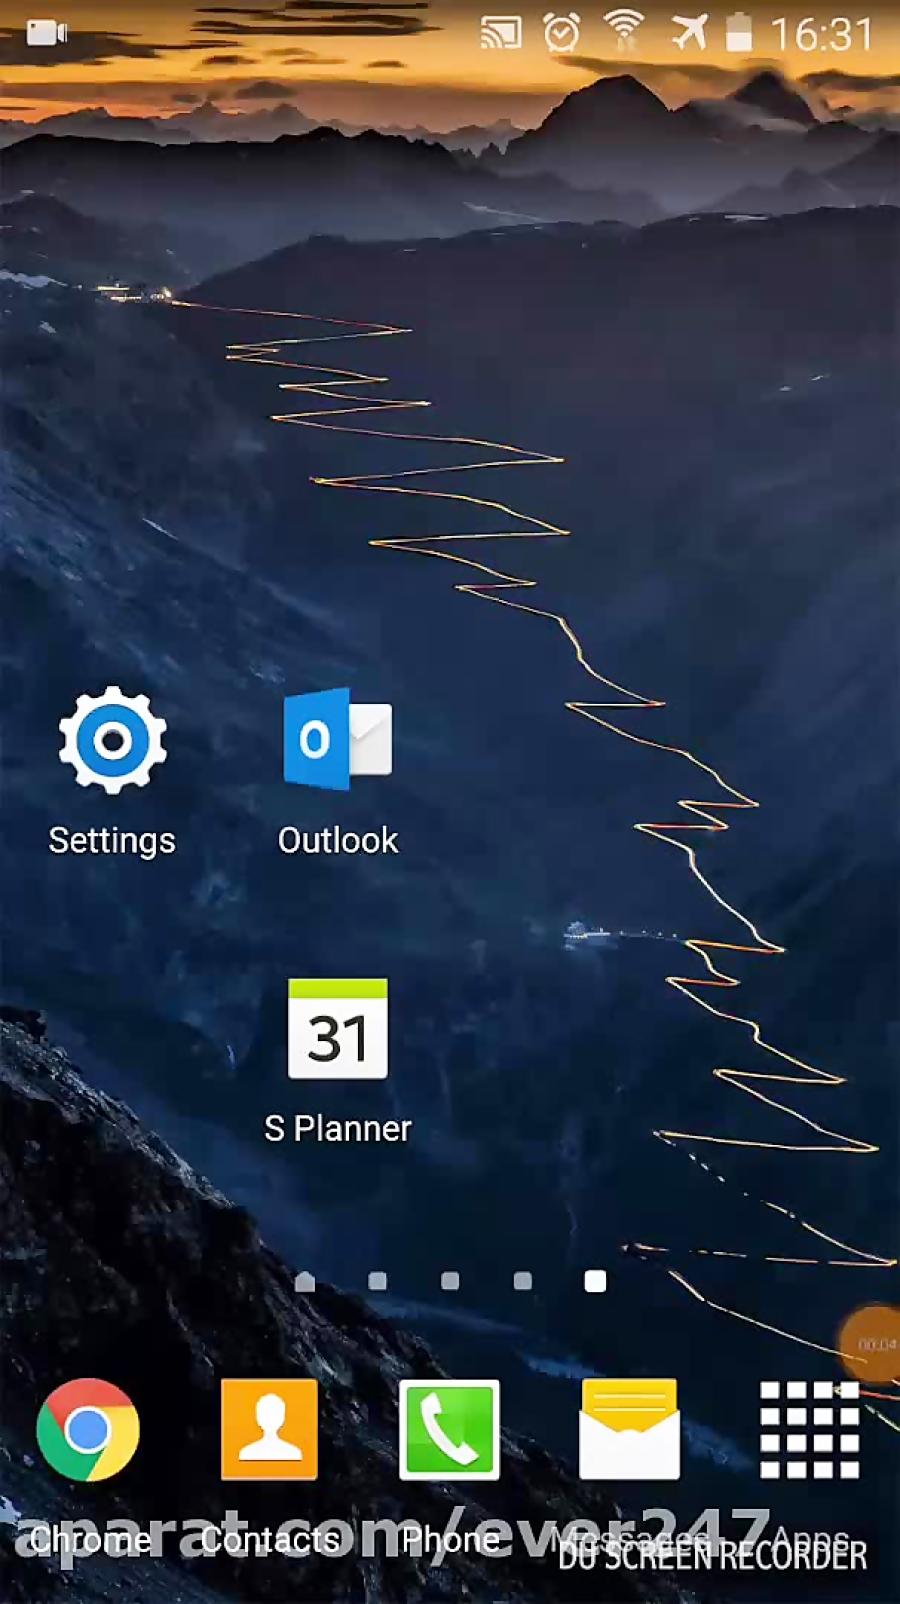 آموزش نحوه اتصال تقویم اوتلوک به تقویم موبایل